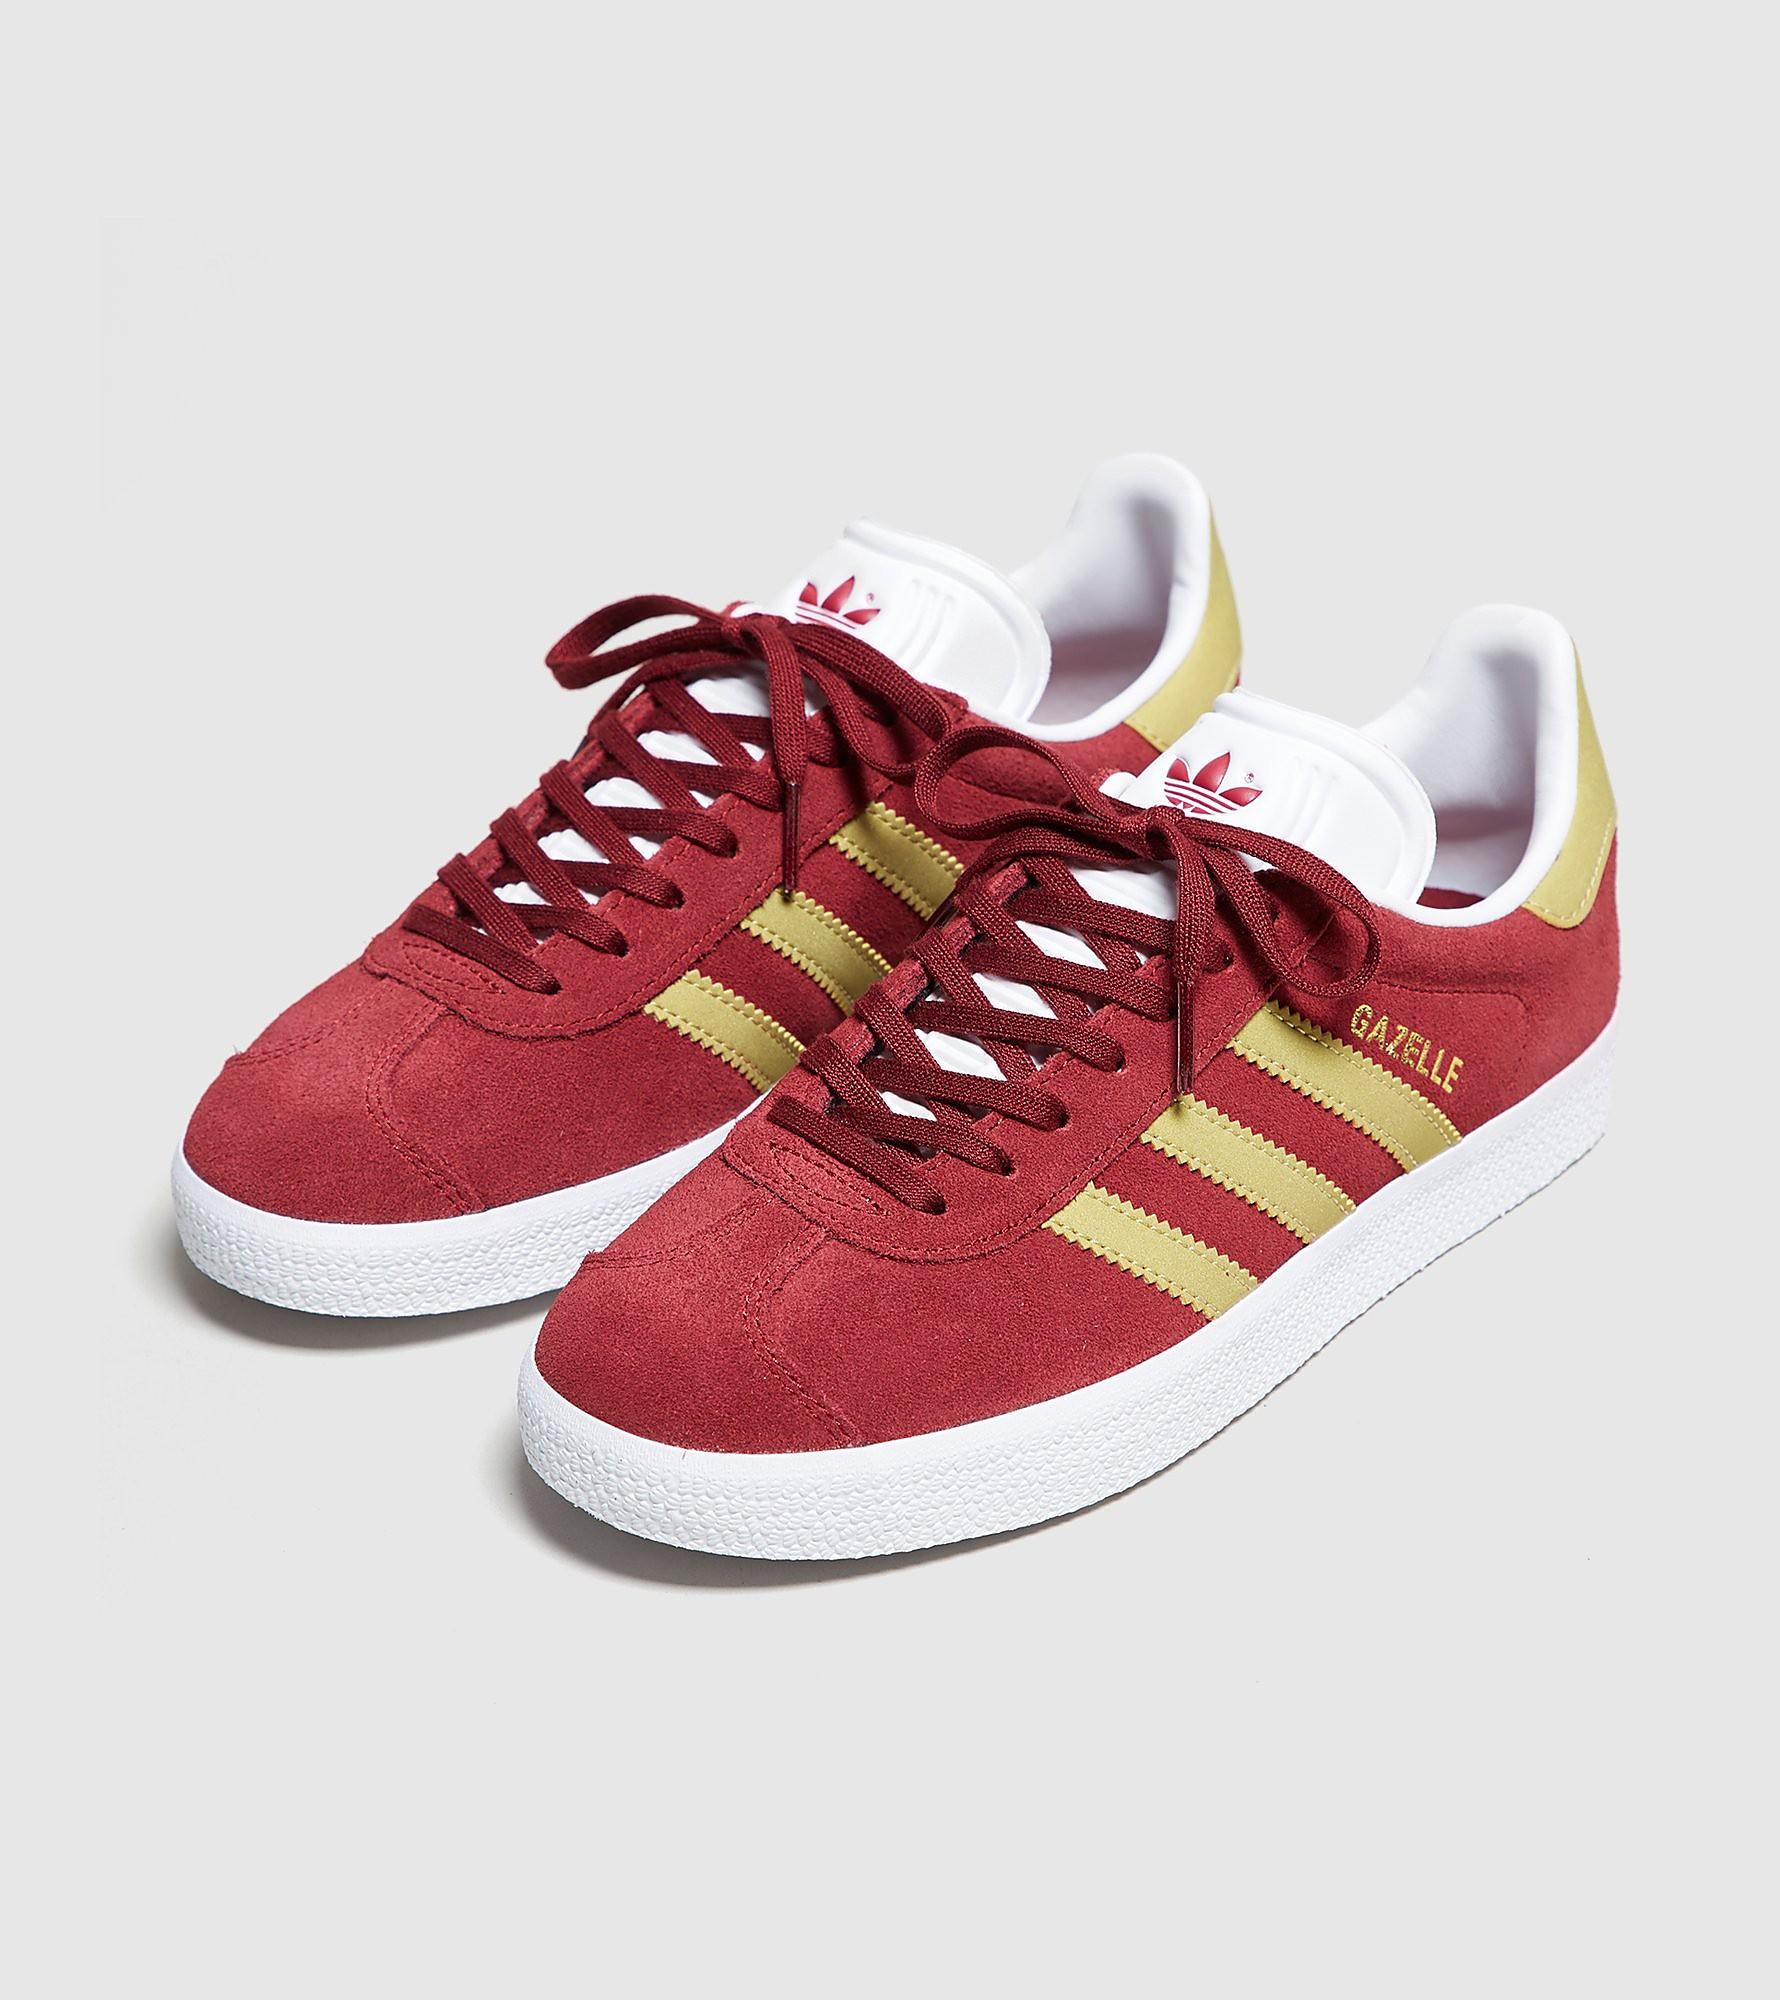 adidas Originals Gazelle Women's, Red/Yellow